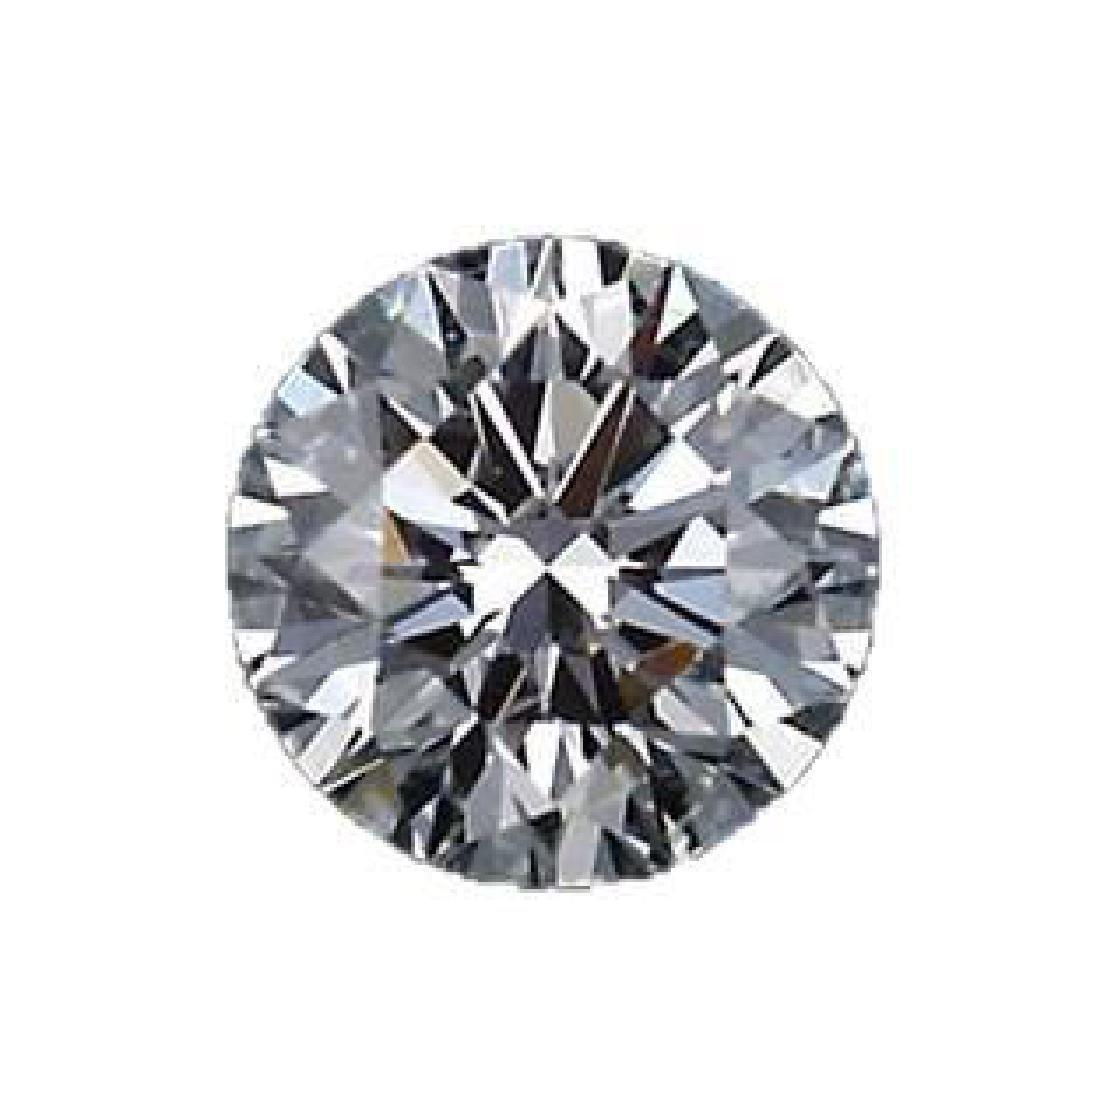 9ct Round Brilliant Cut BIANCO Diamond